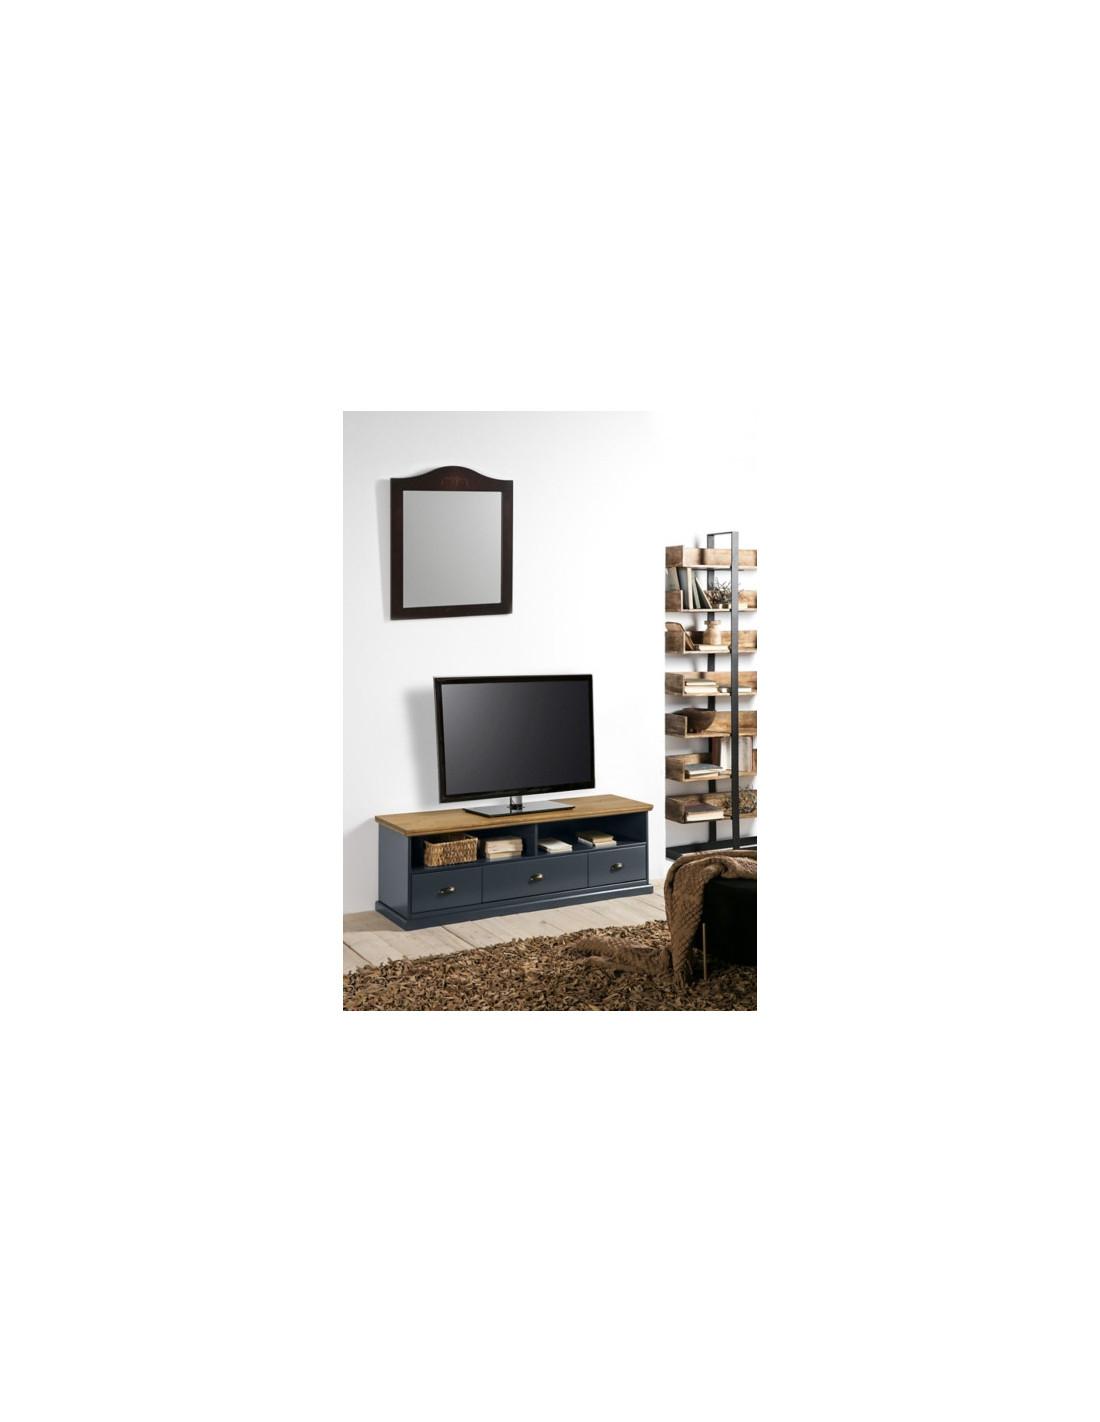 Meuble Tv Alphonse Gris Anthracite/ Pin Massif - Meuble Tv But tout Meuble Tv Alphonse But